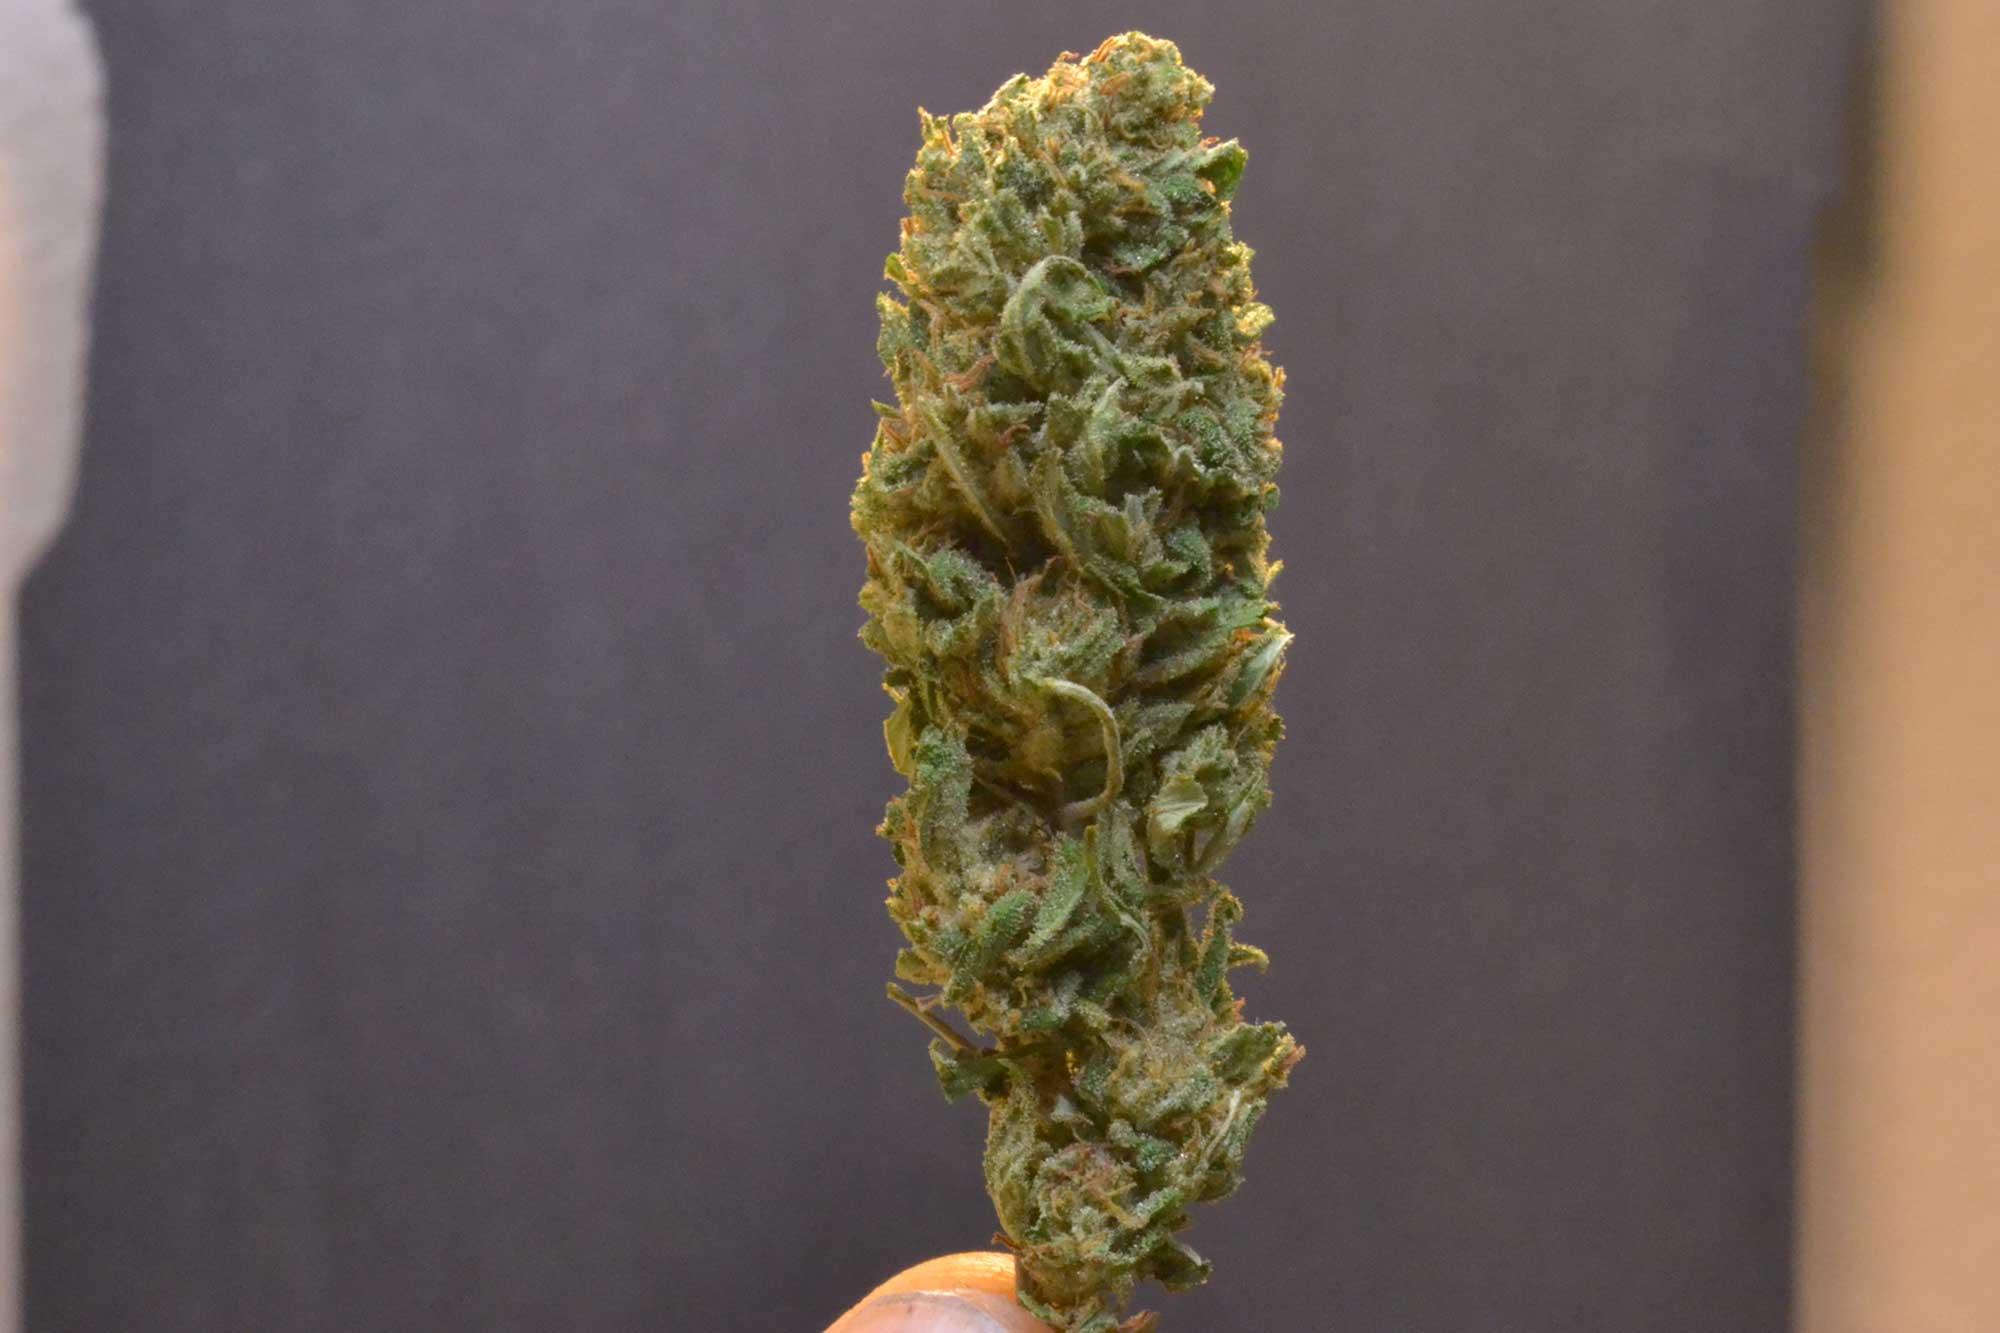 Lifter Cannabis bud